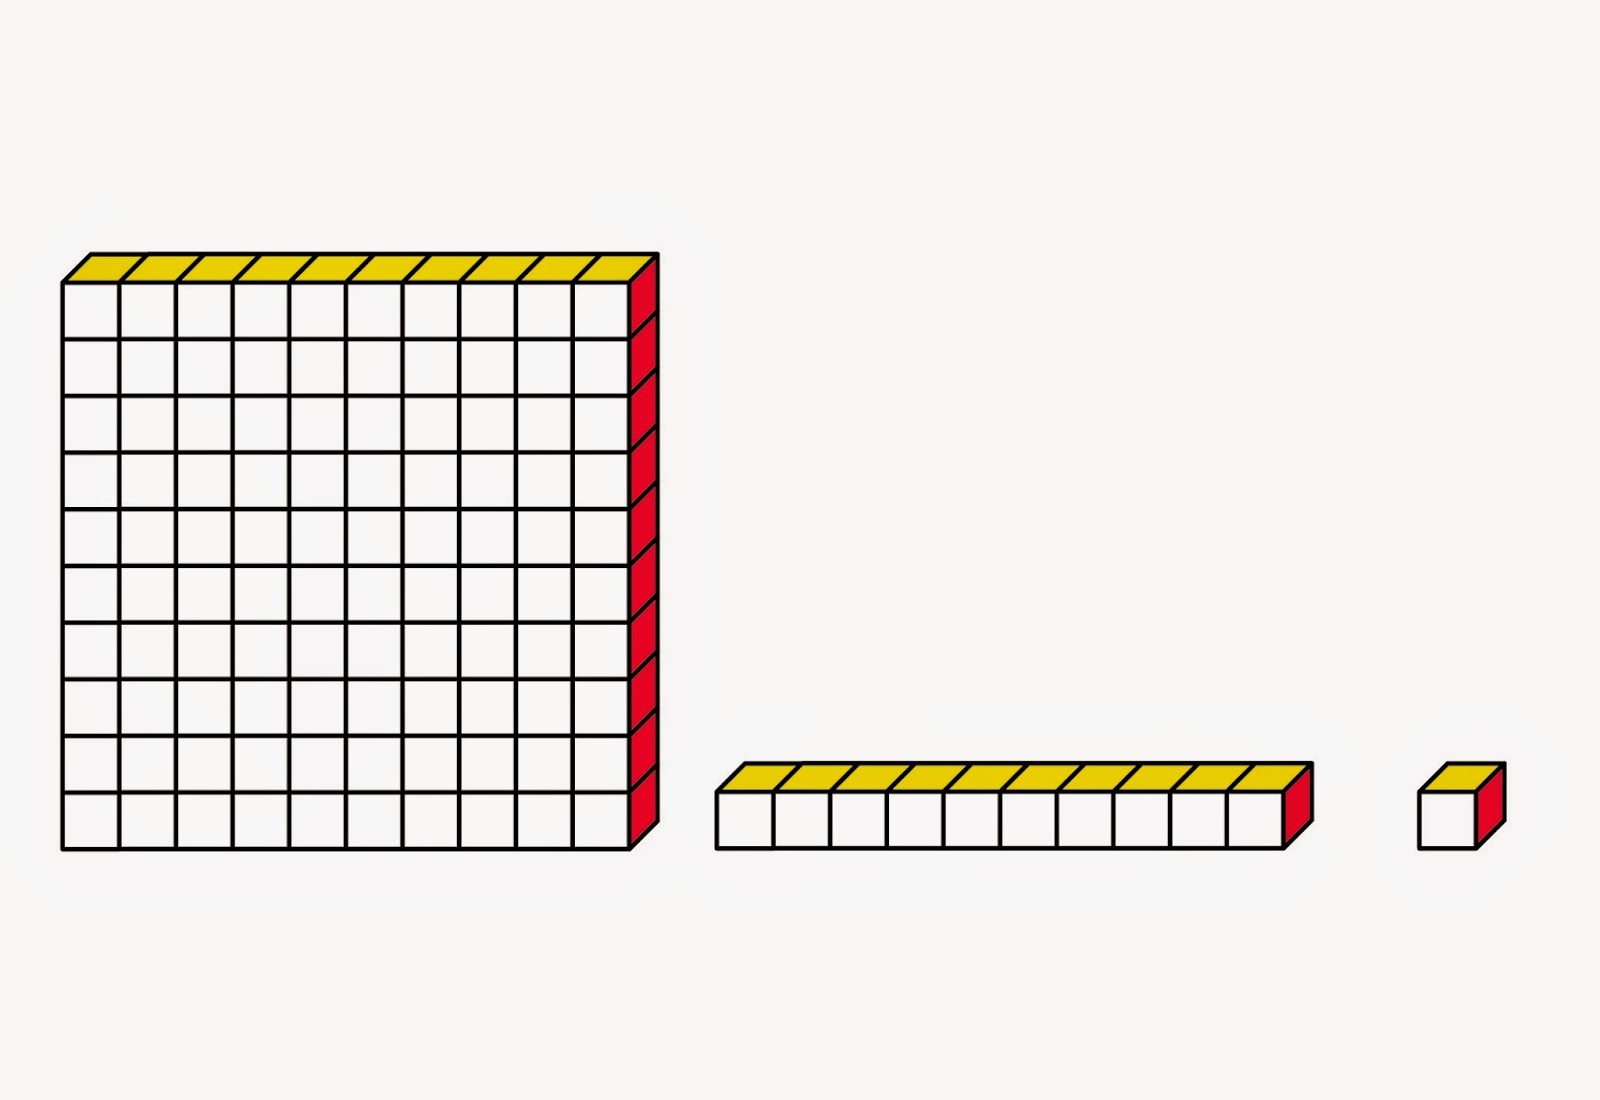 MEDIAN Don Steward mathematics teaching: base 10 (Dienes) blocks